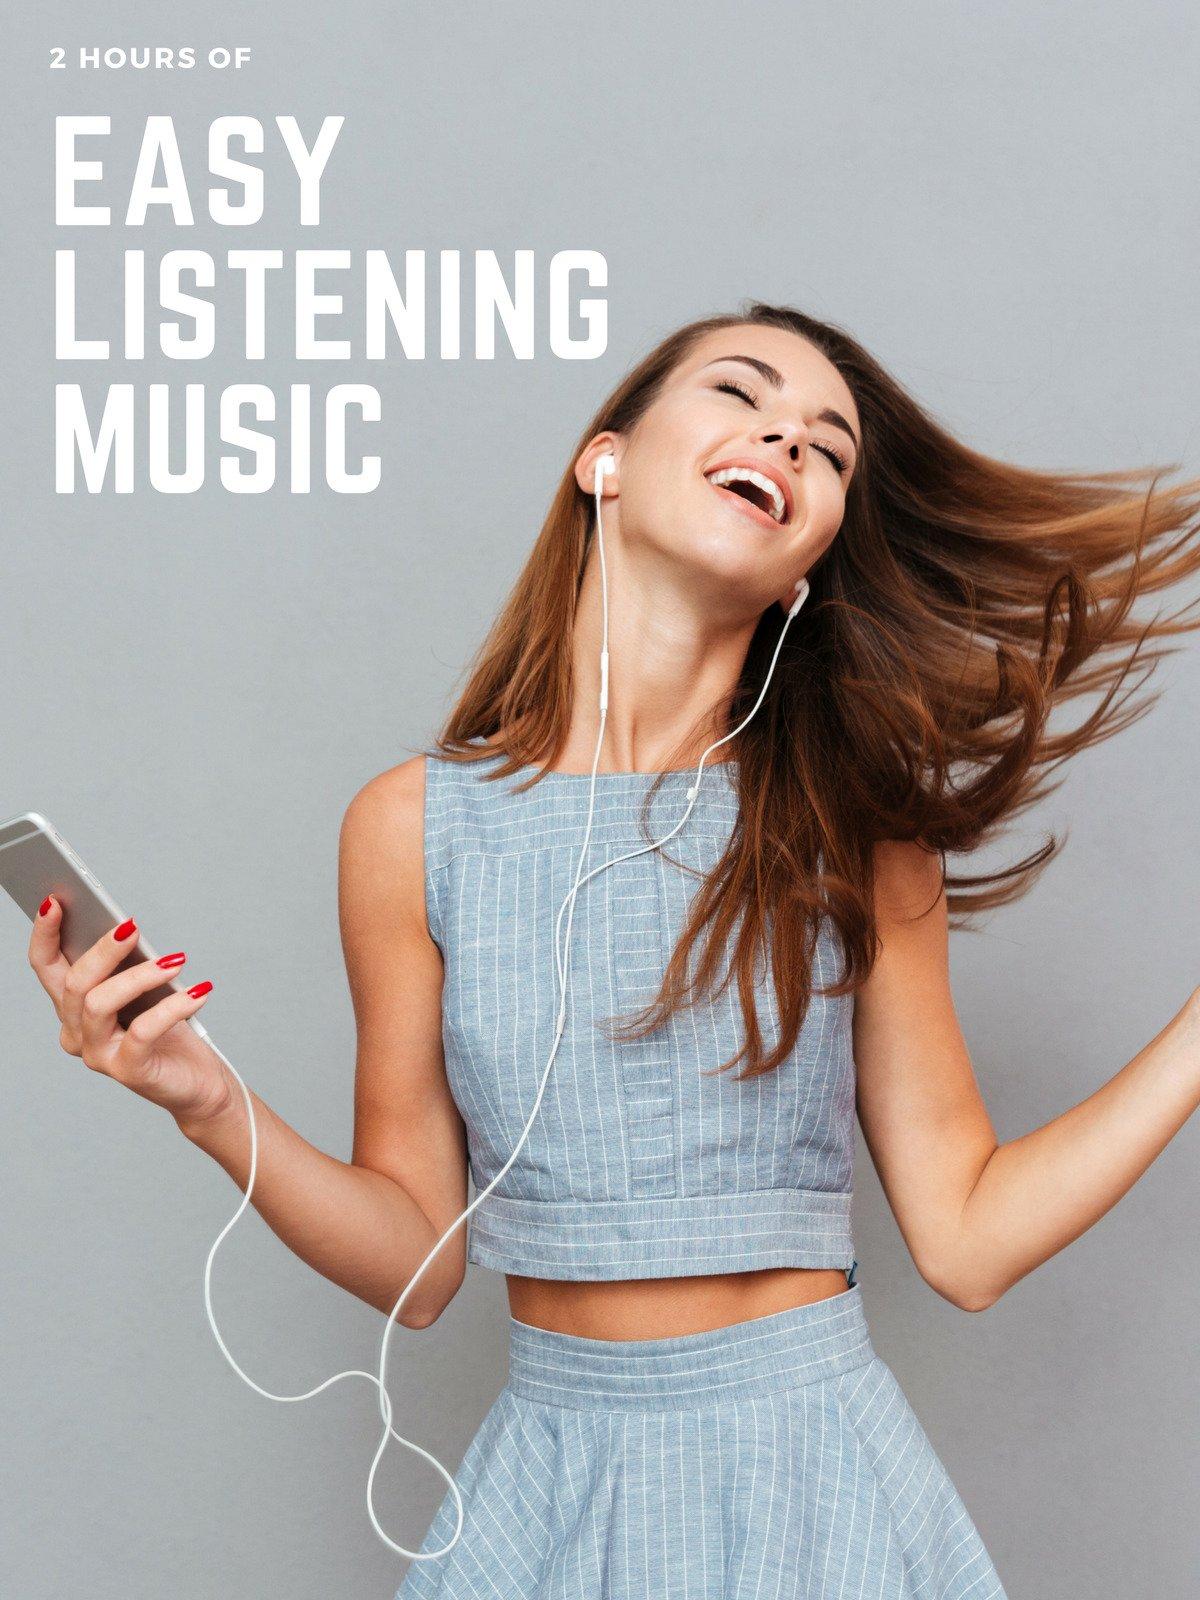 2 Hours of Easy Listening Music